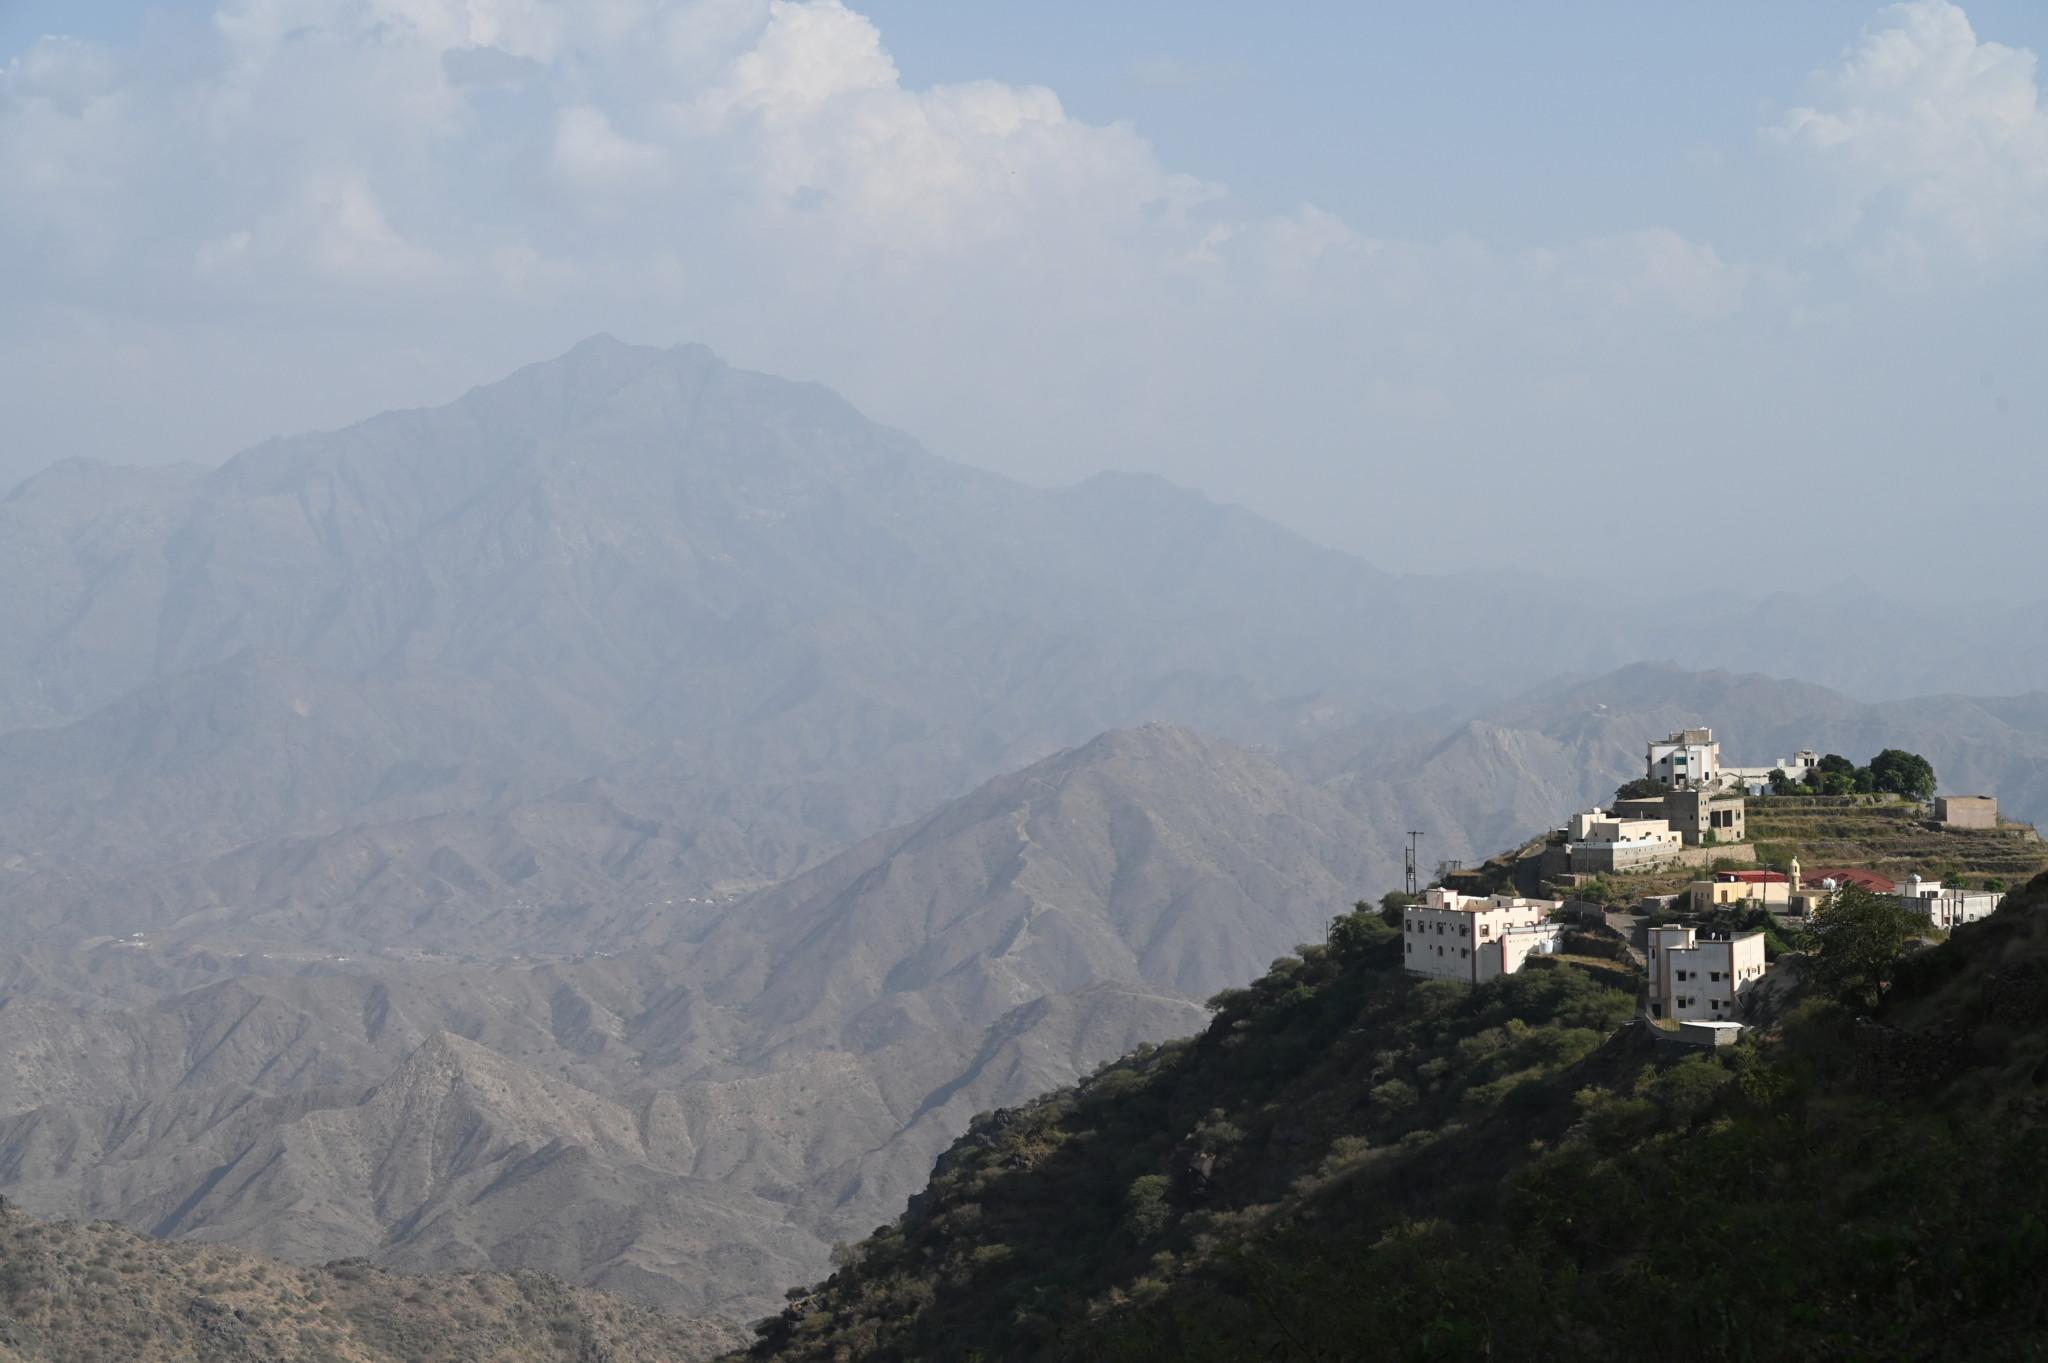 Die Fayfa Mountains in Jizan gehören zum Saudi-Roadtrip dazu